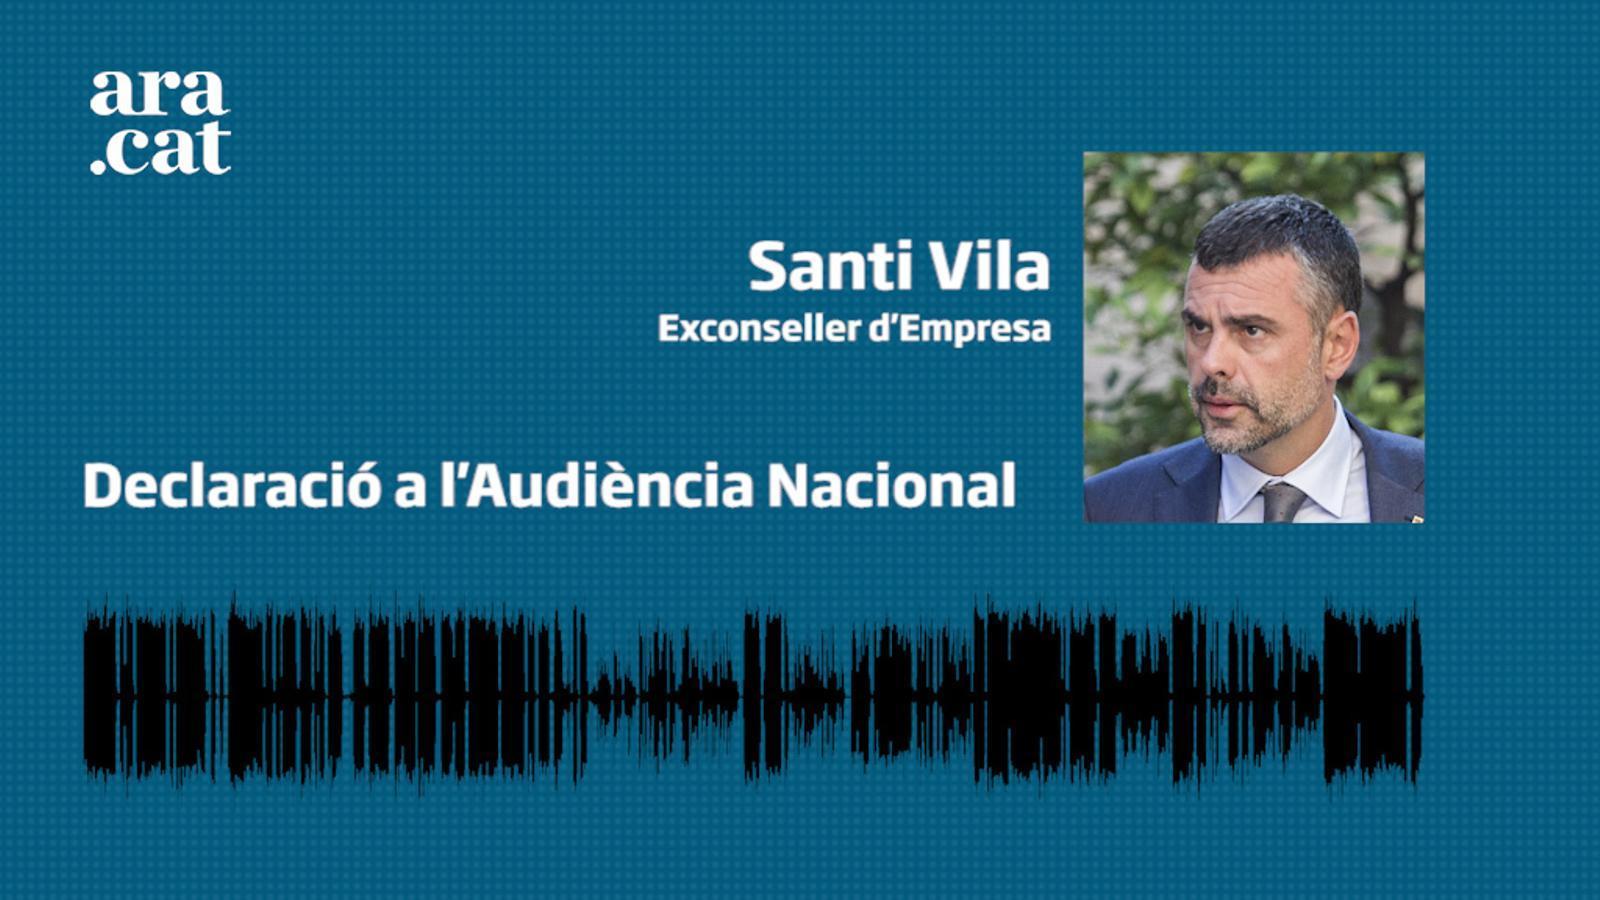 Santi Vila declara a l'Audiència Nacional - testimoni 1